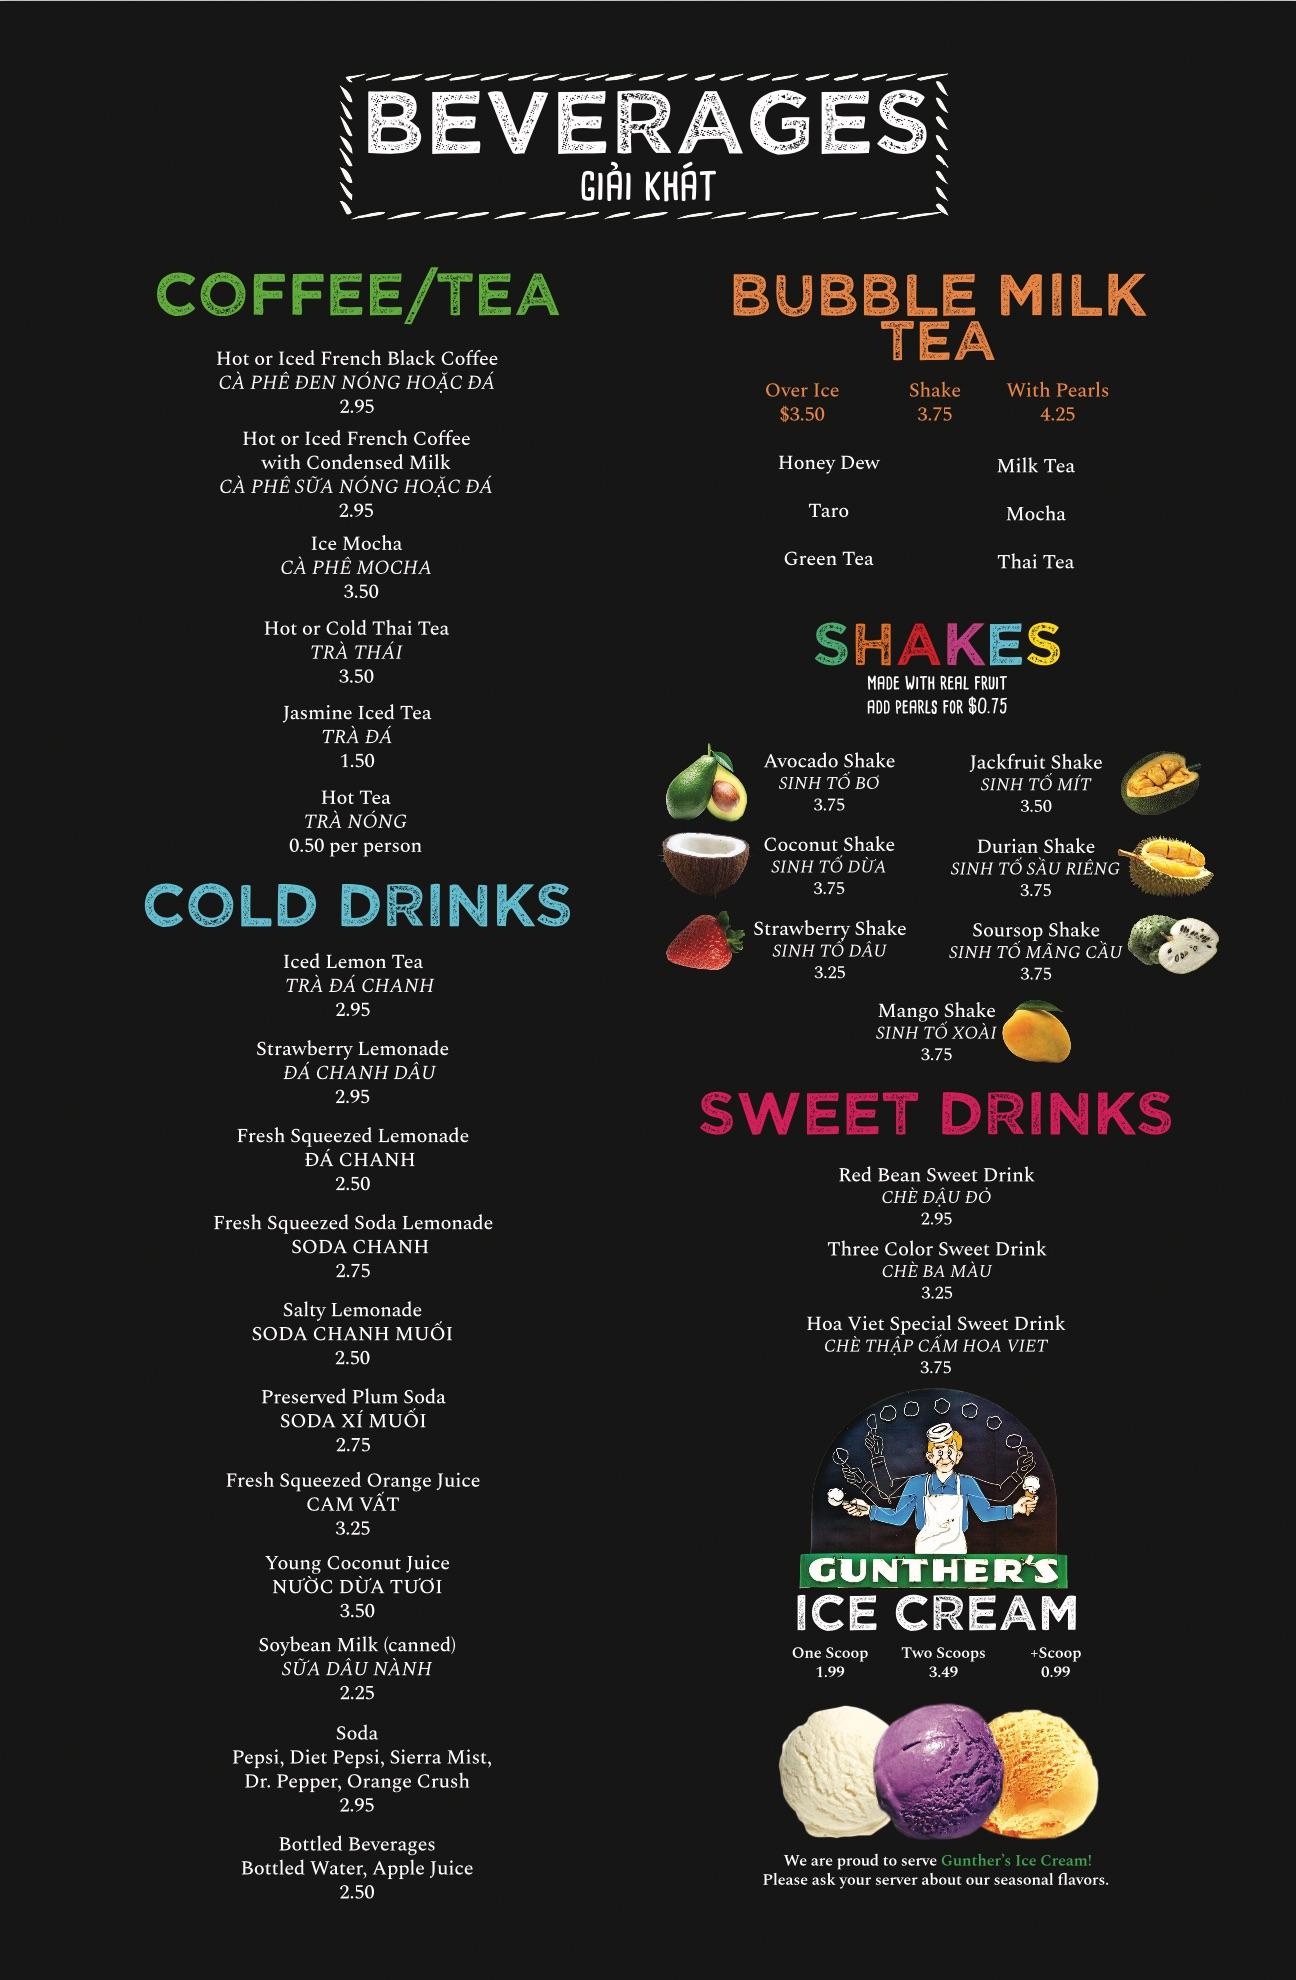 14. Drinks